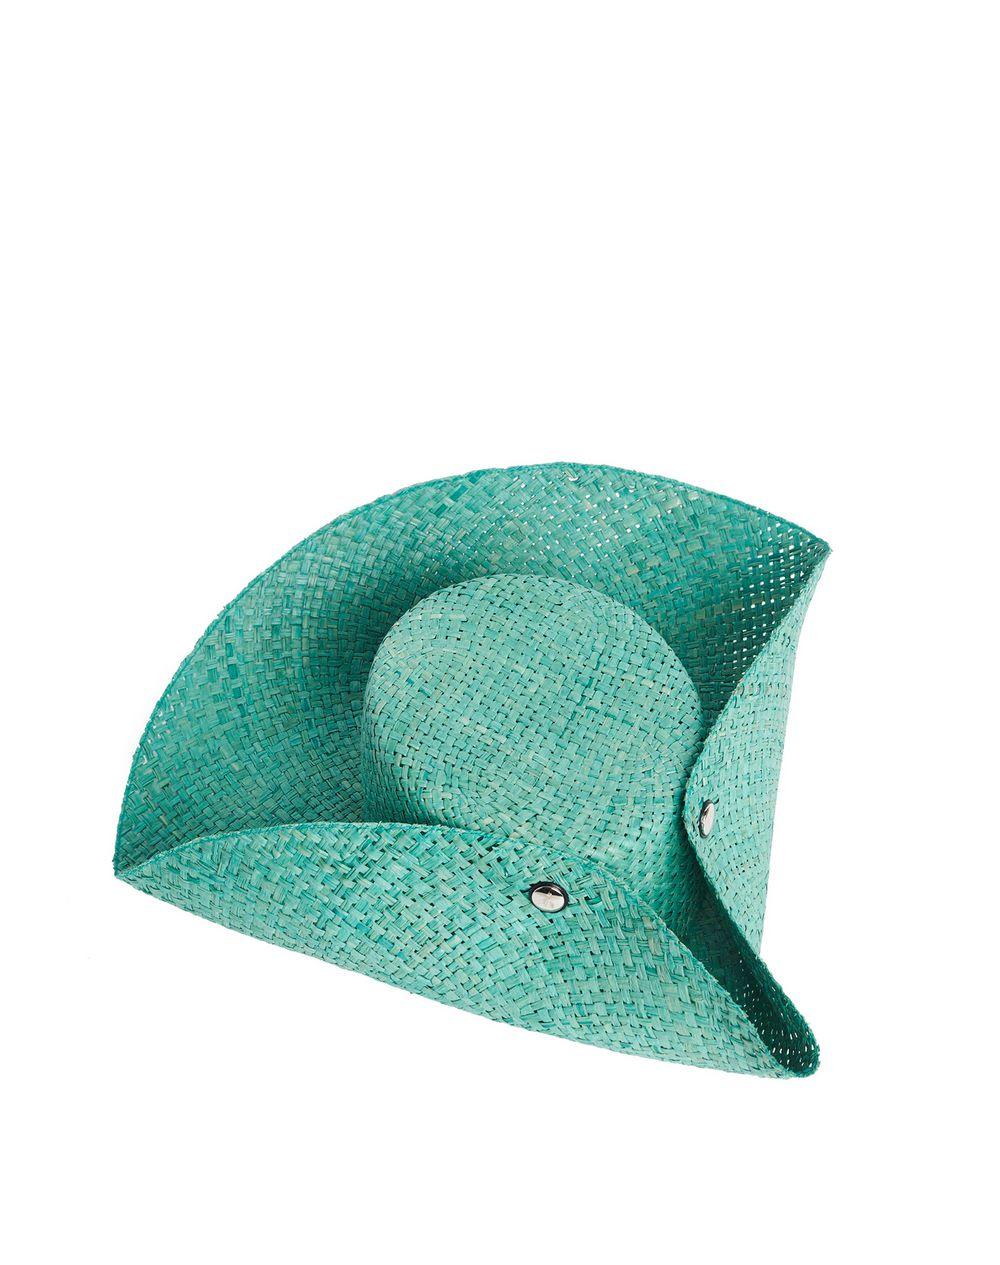 STRAW HAT - Lanvin